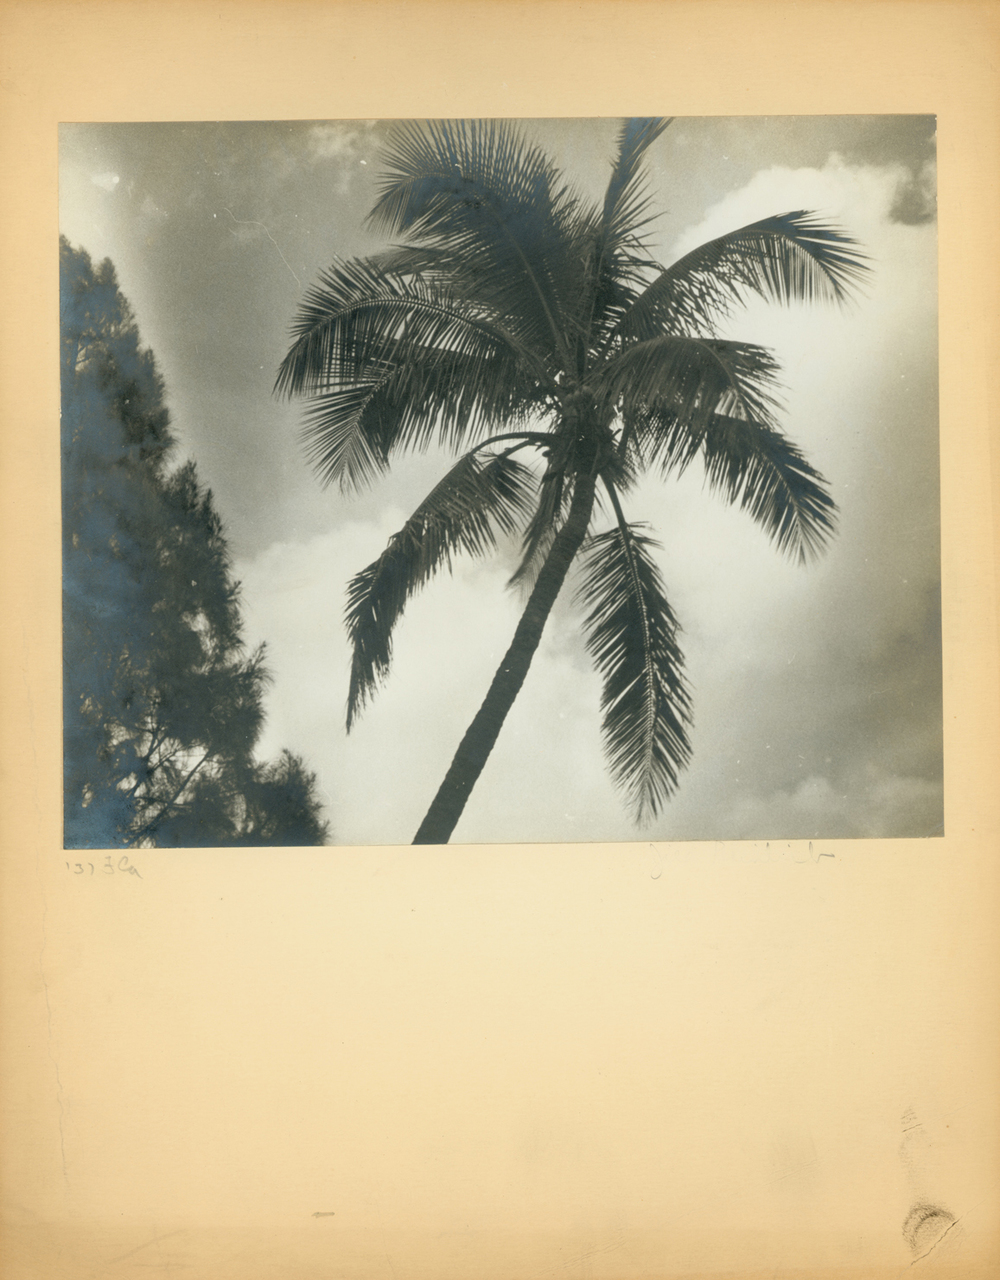 Hialeah, Florida 1937